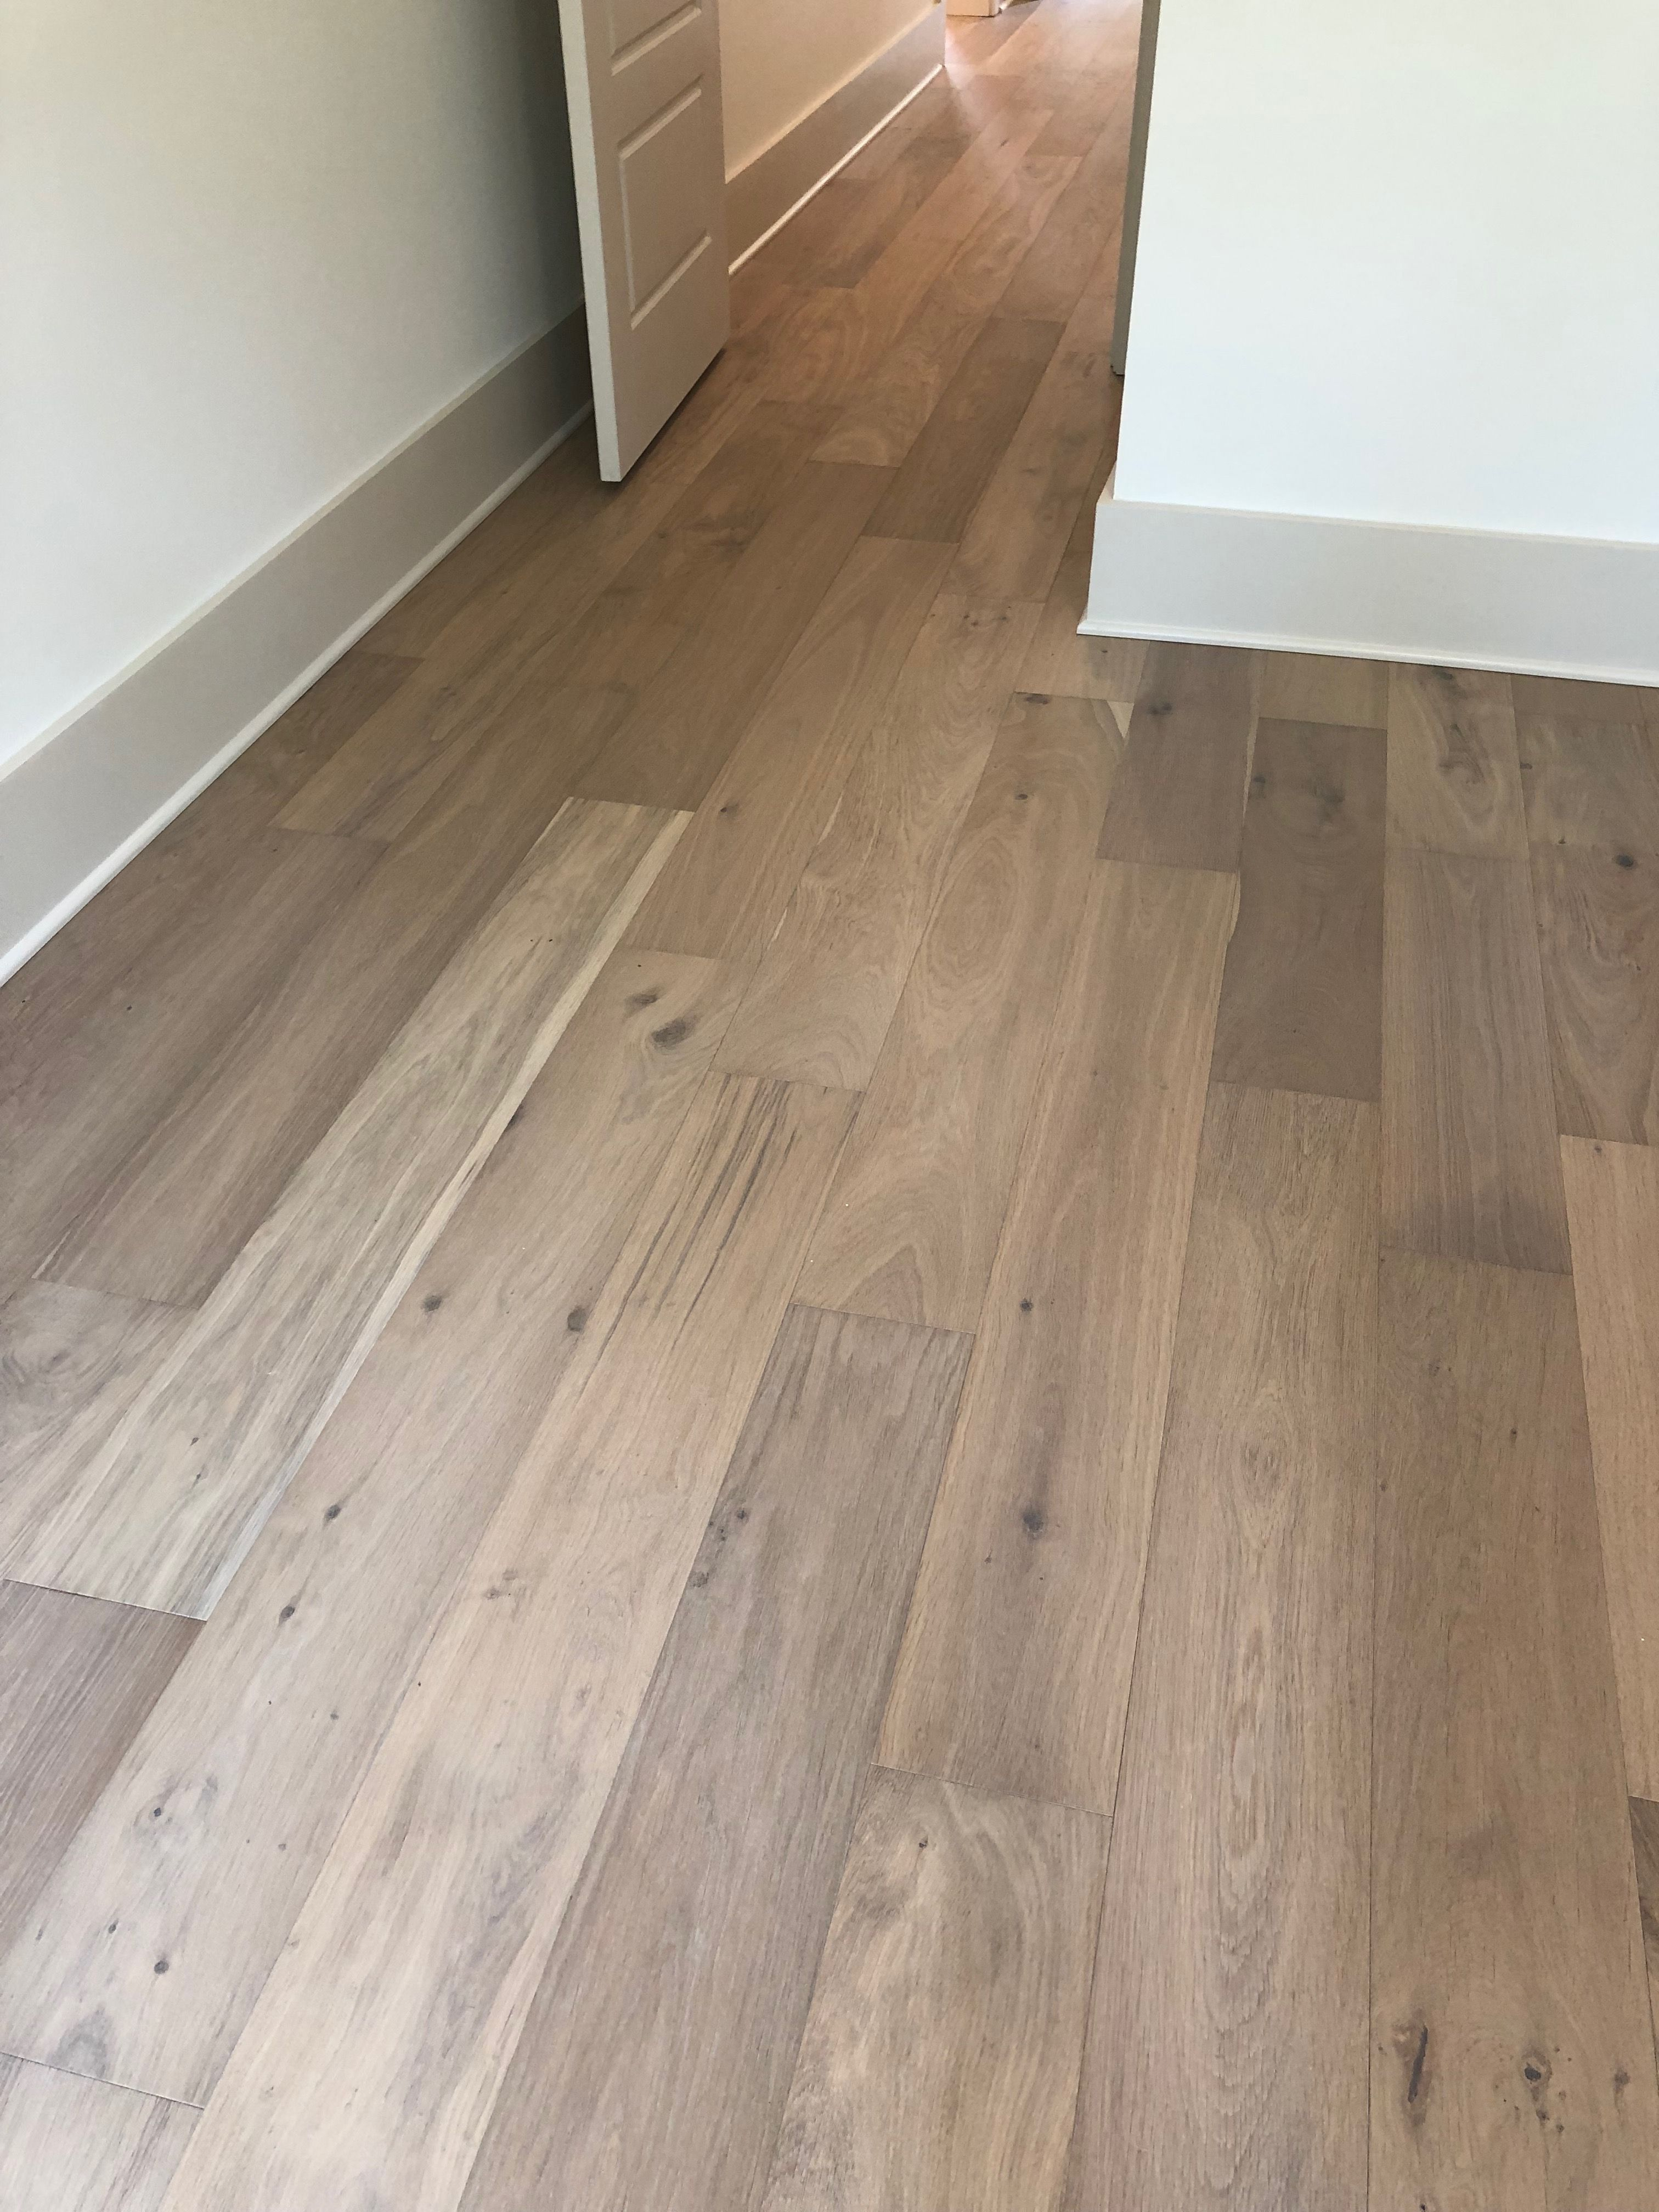 Pin by Betty Reed on Flooring Flooring, Hardwood floors